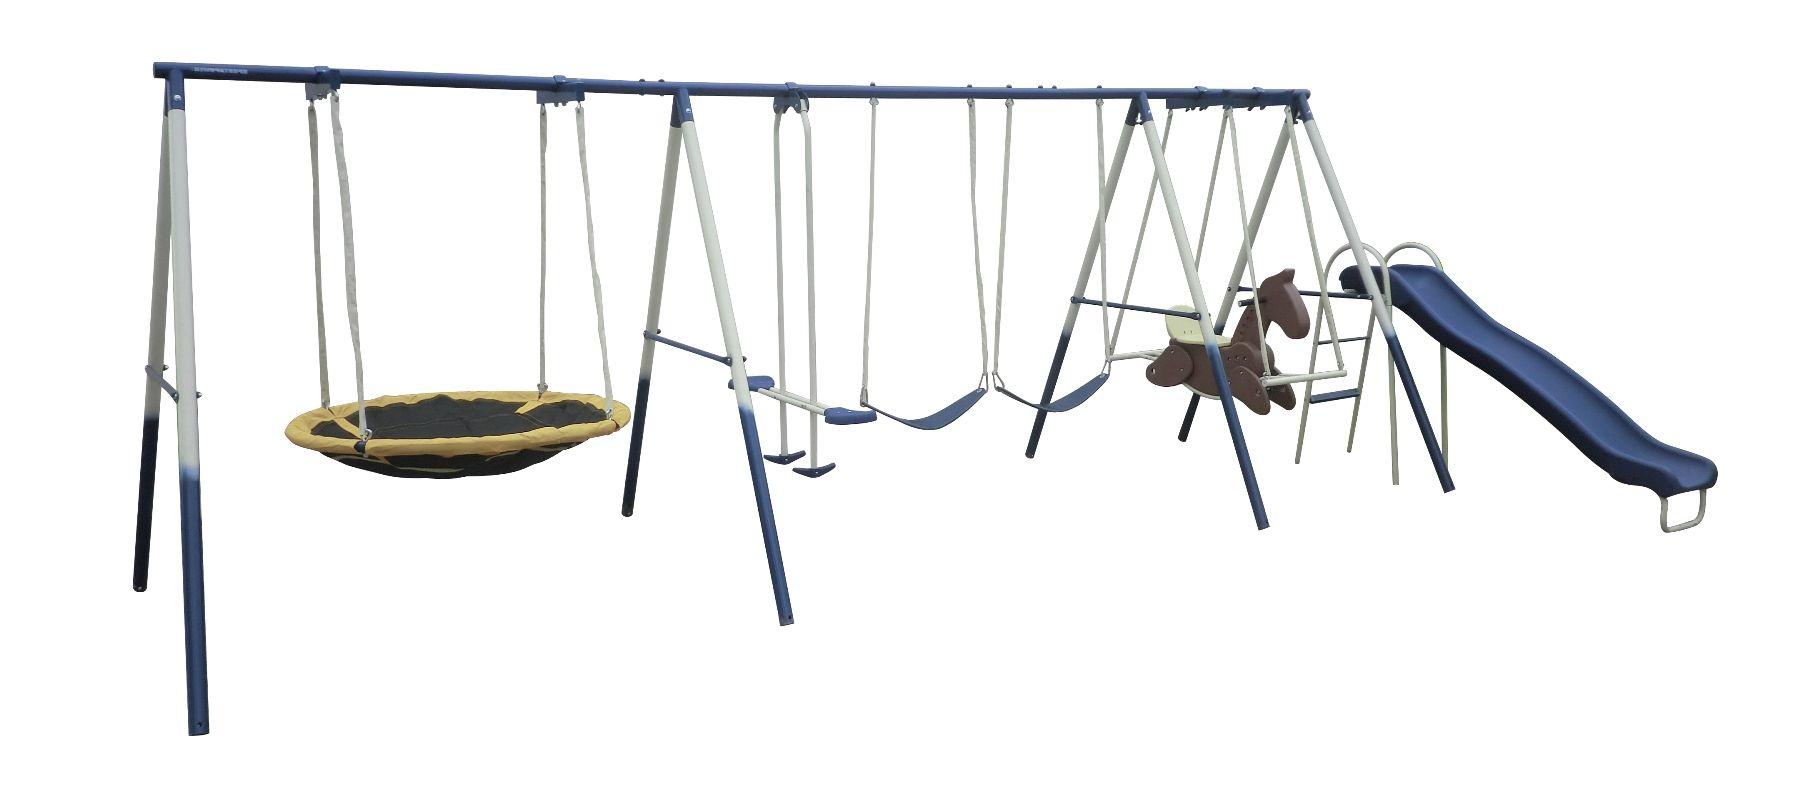 Super Fun 8 Station Swing Set Outdoor Recreational Toys Walmart